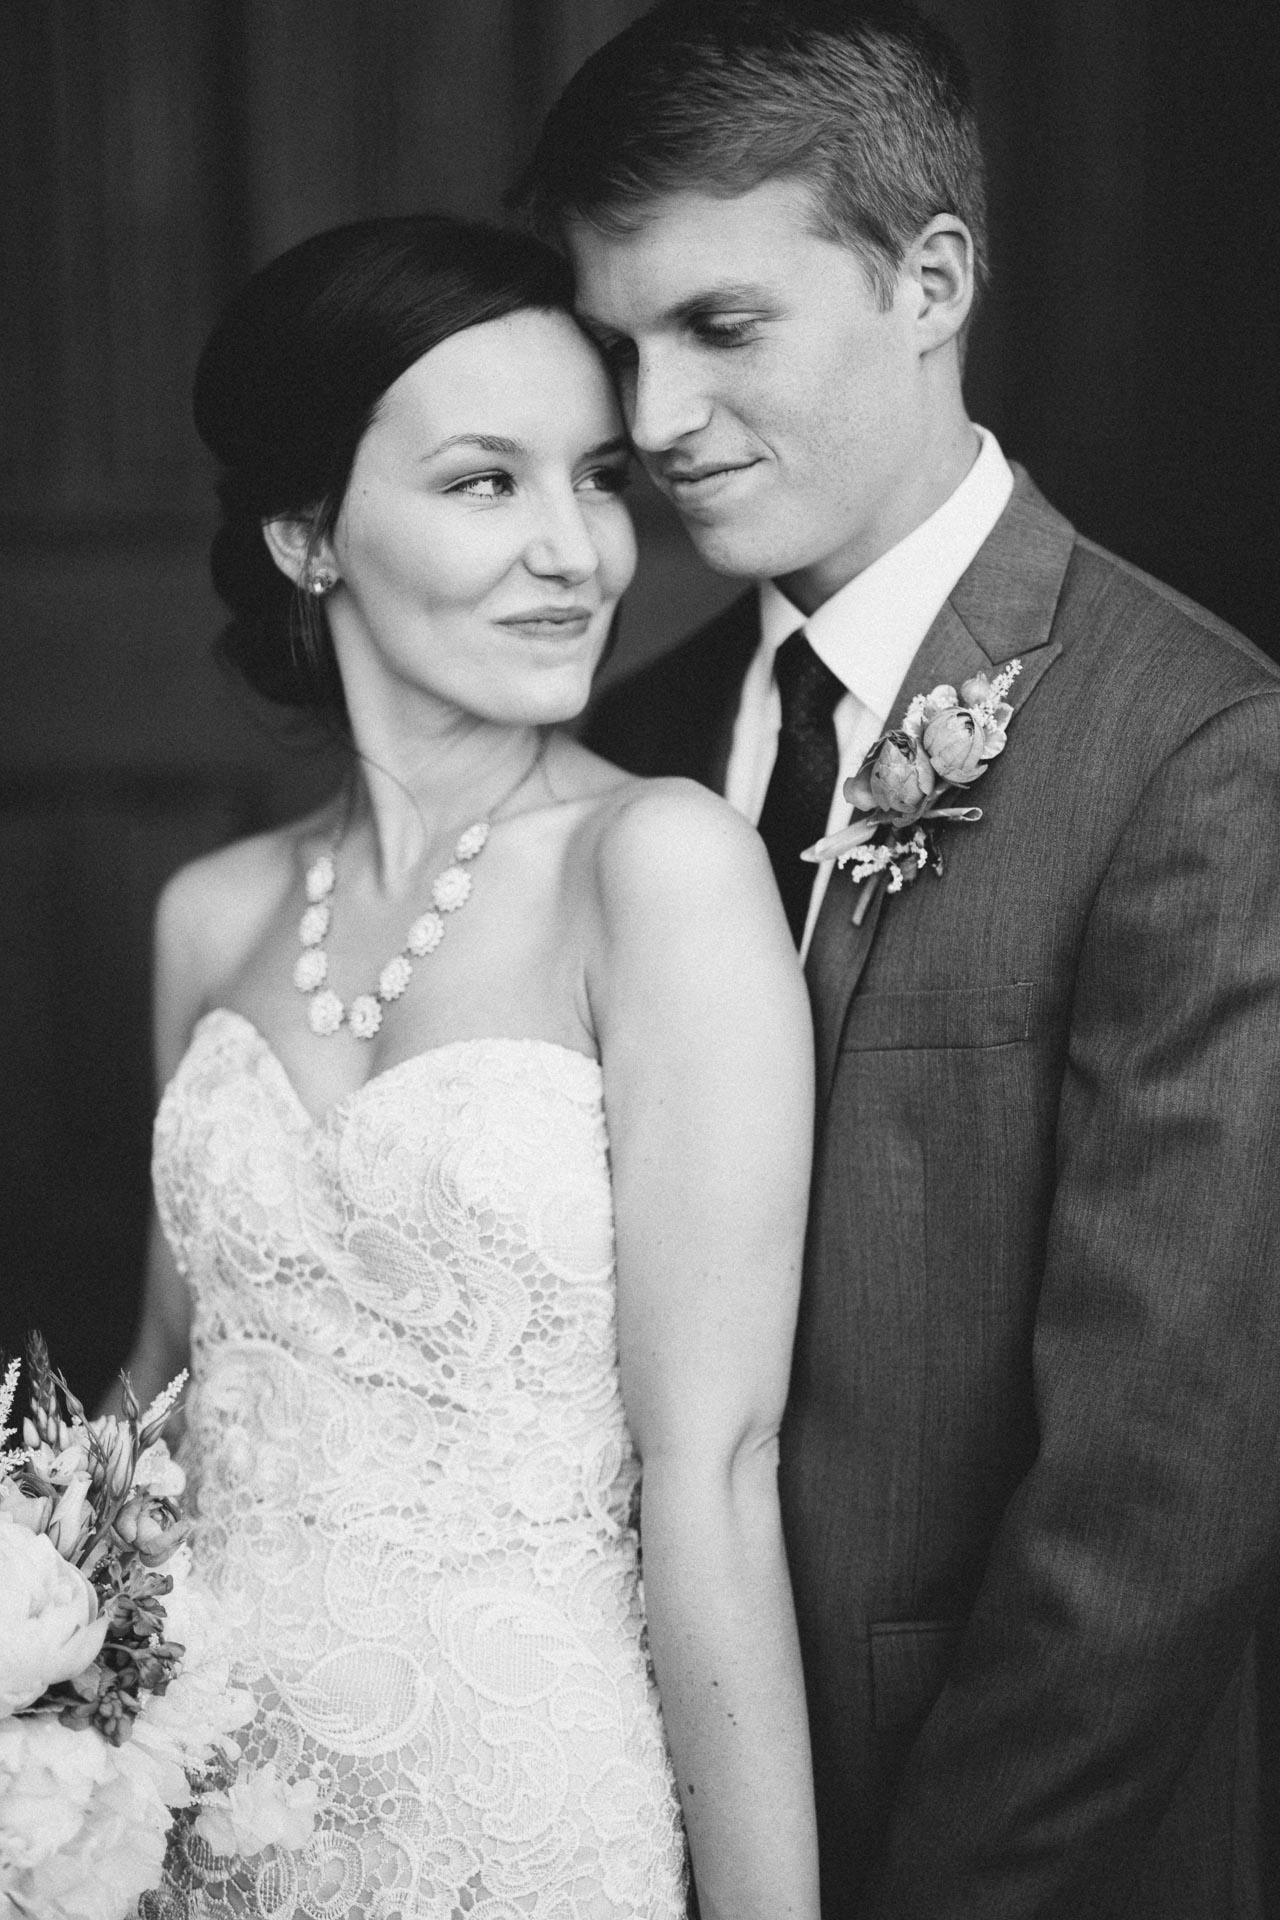 Julia-Michael-Cincinnati-Music-Hall-Wedding-080@2x.jpg